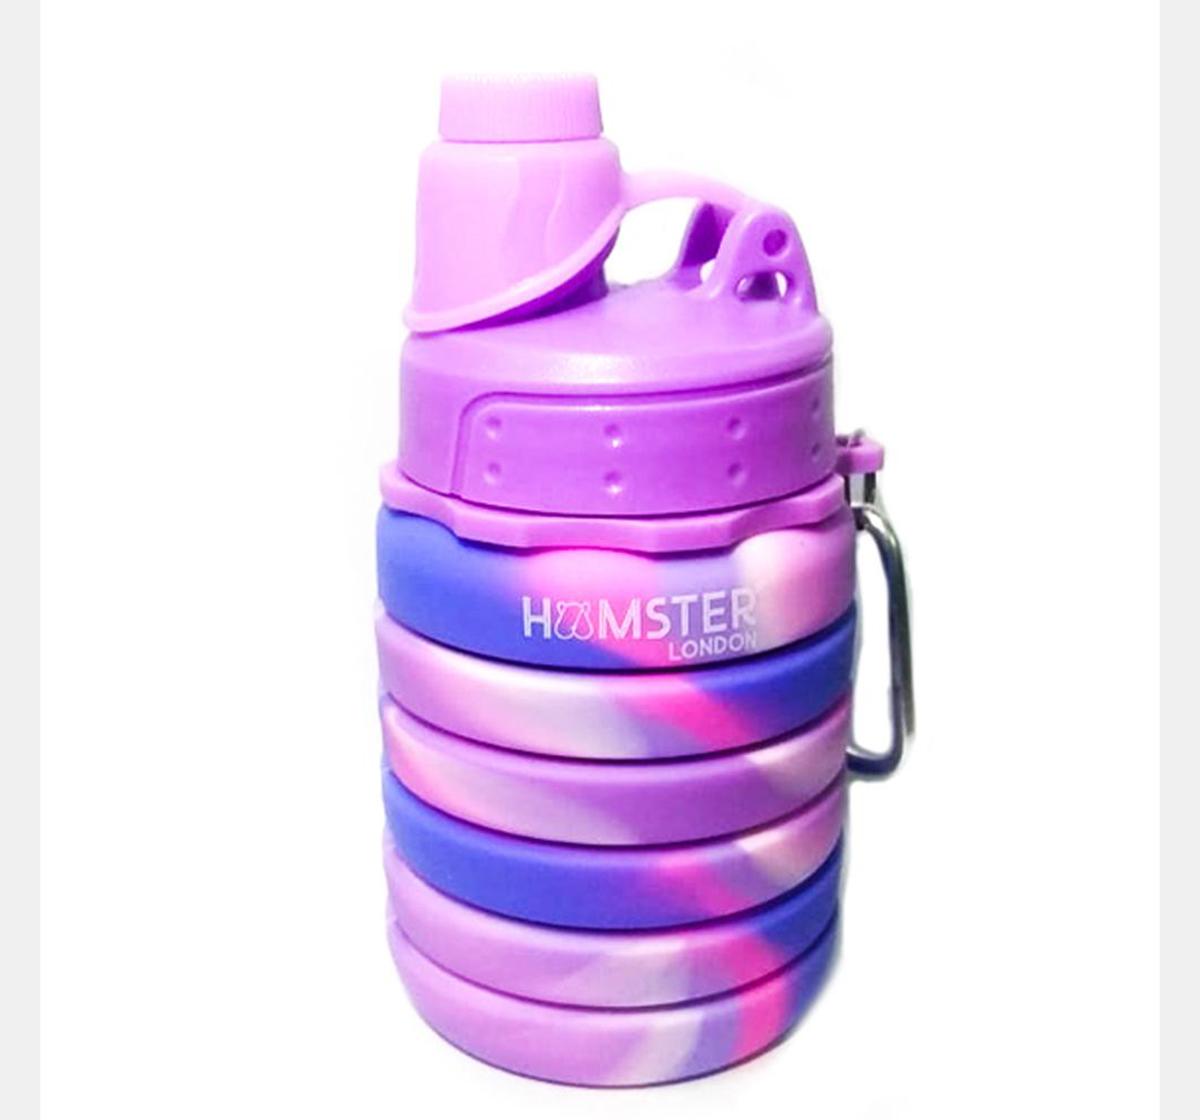 Hamster London | Hamster London Bendable Bottle Pink Purple, 4Y+